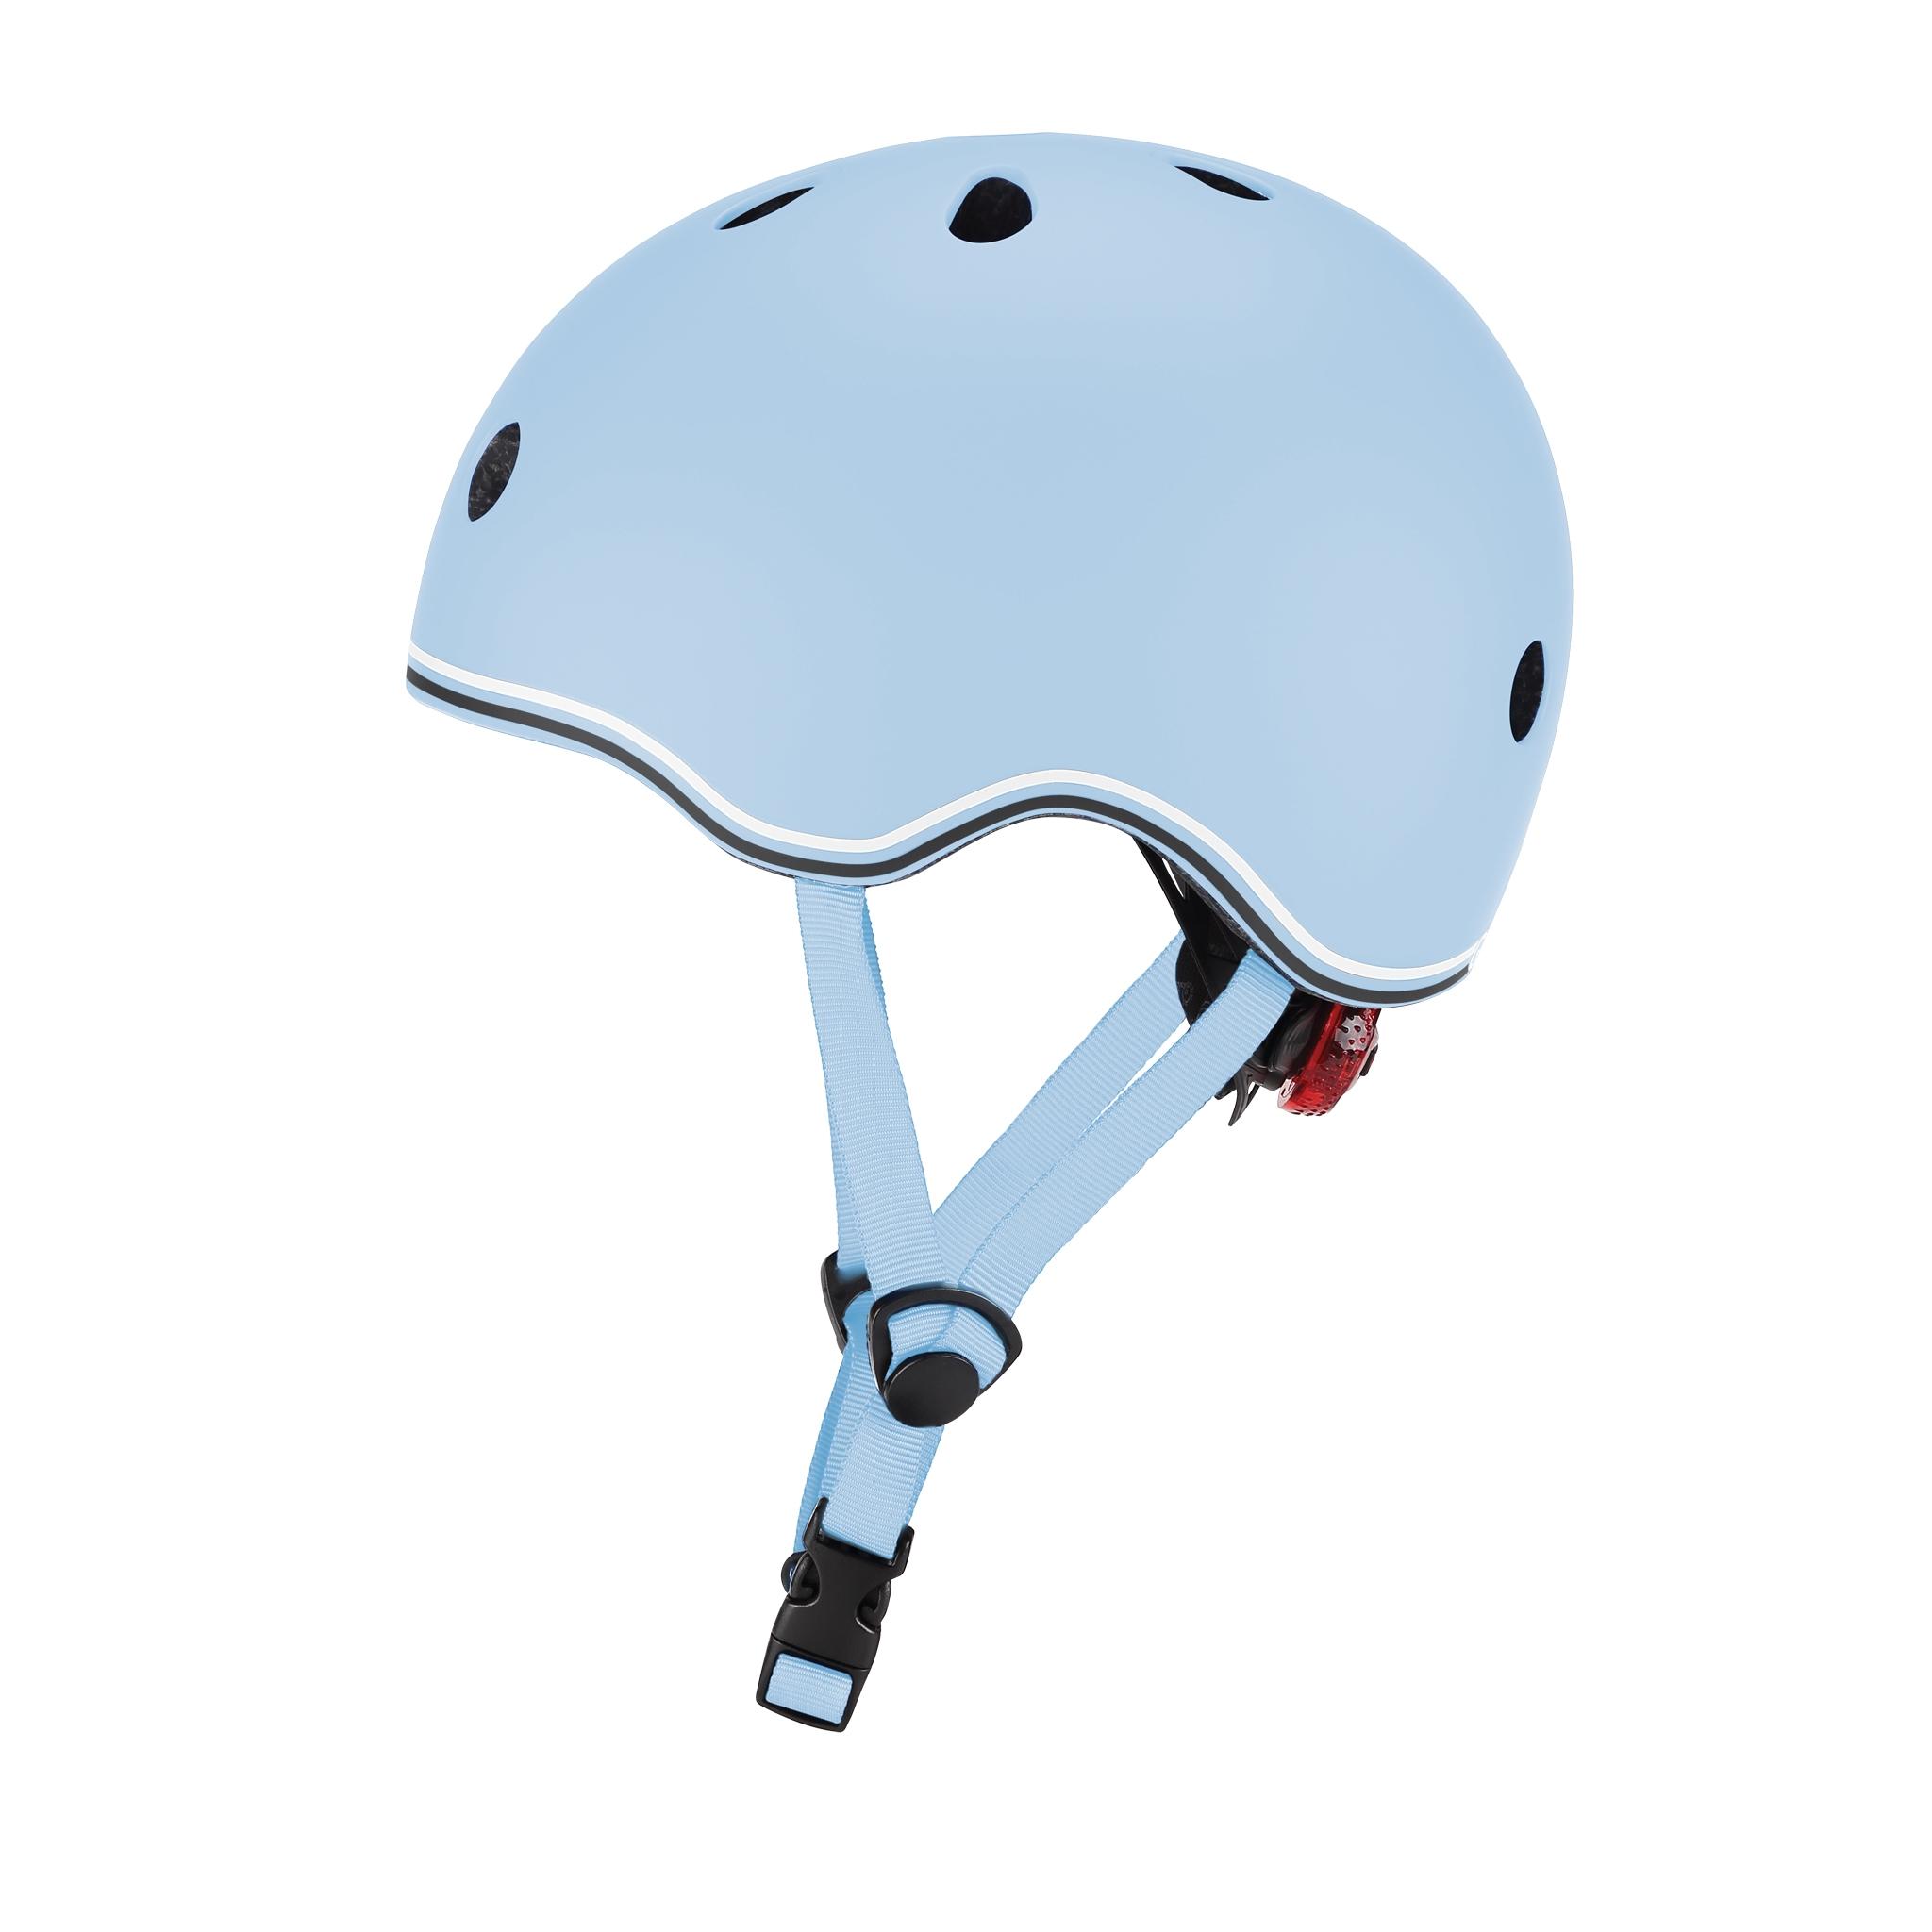 GO-UP-helmets-scooter-helmets-for-toddlers-with-adjustable-helmet-knob-pastel-blue 1